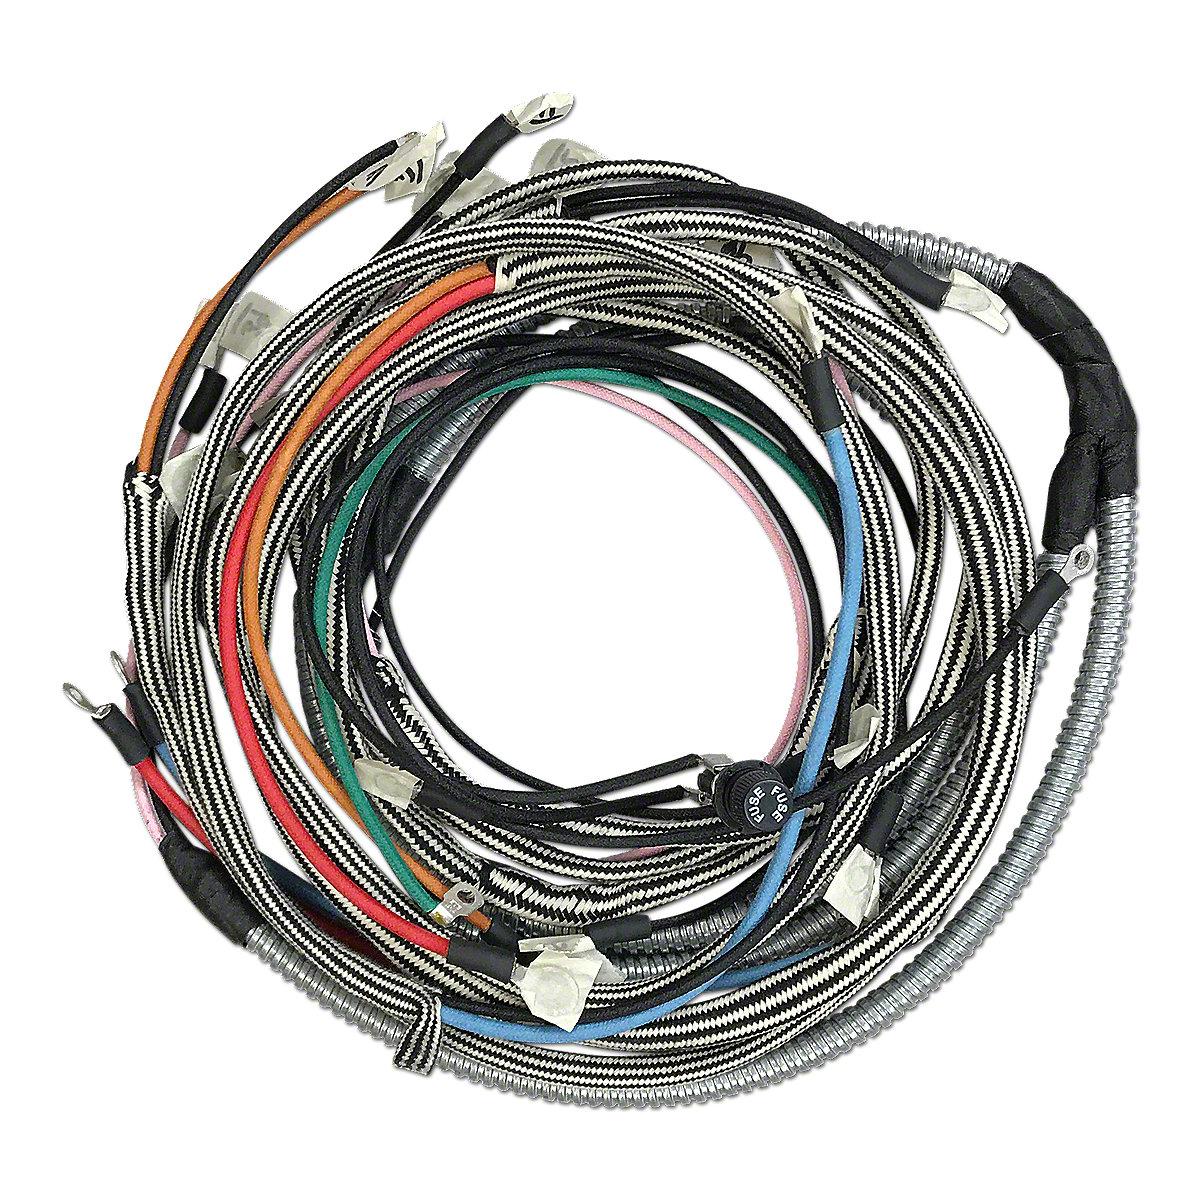 Eign17 4 Cyl Ih Distributorw Clips Farmall Super C Wiring Harness Restoration Quality